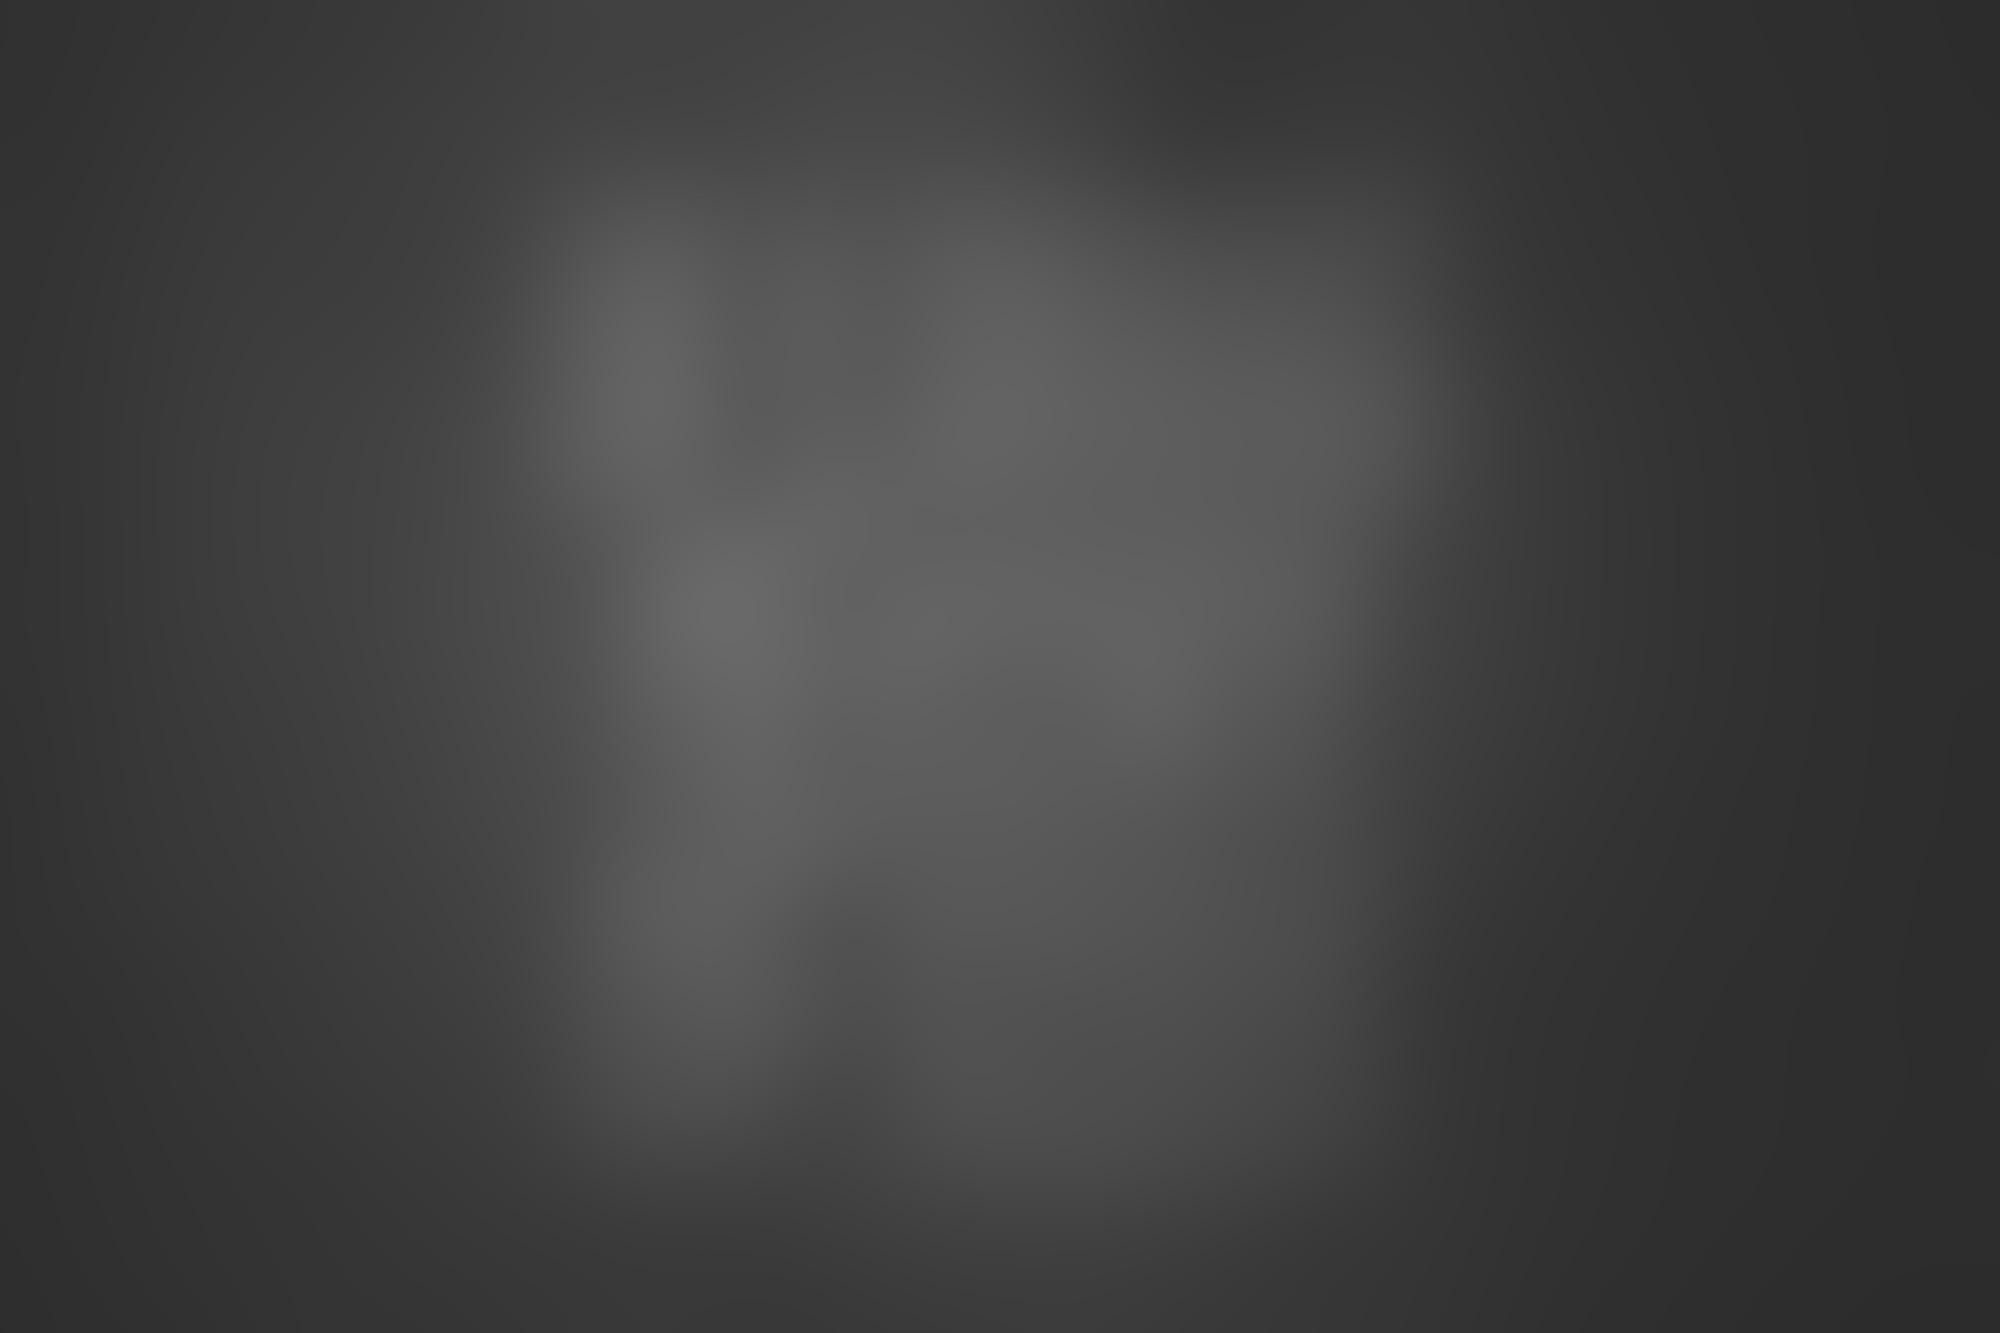 ILMW Coal Jacket Sparkle autocompressfitresizeixlibphp 1 1 0max h2000max w3 D2000q80s9693f6b1a3e60835993dc4735f8cb8b1